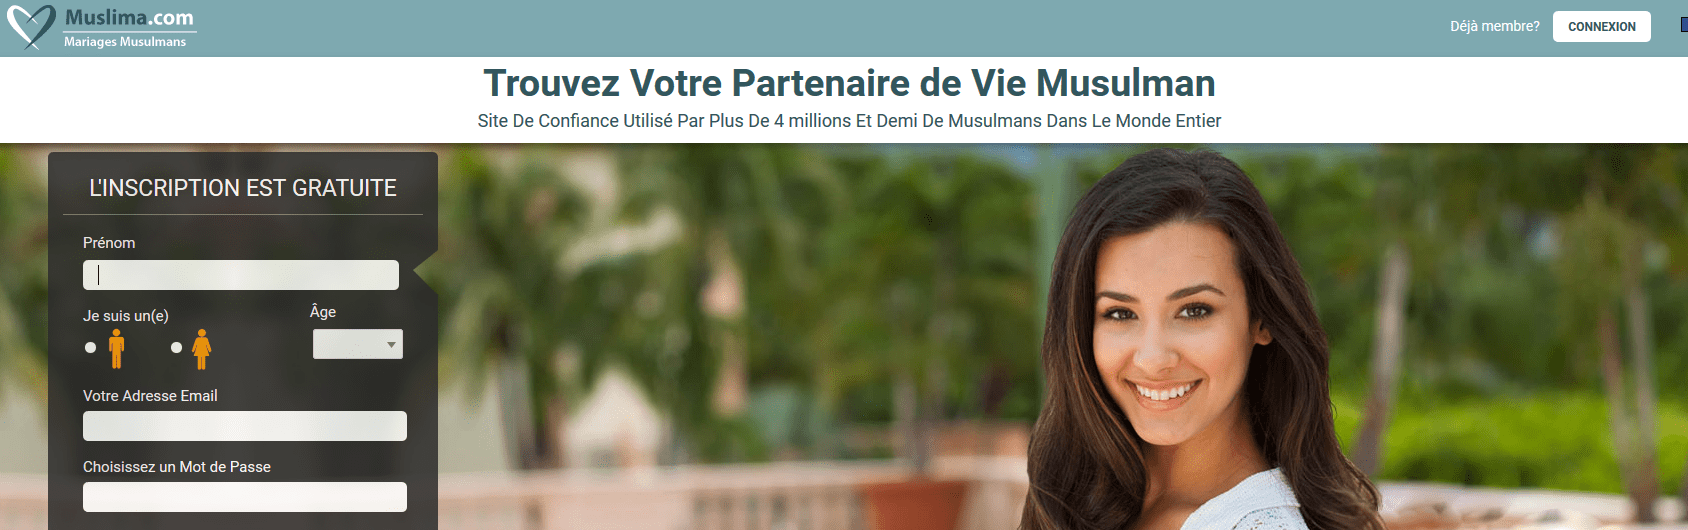 site de rencontre gratuit international musulman